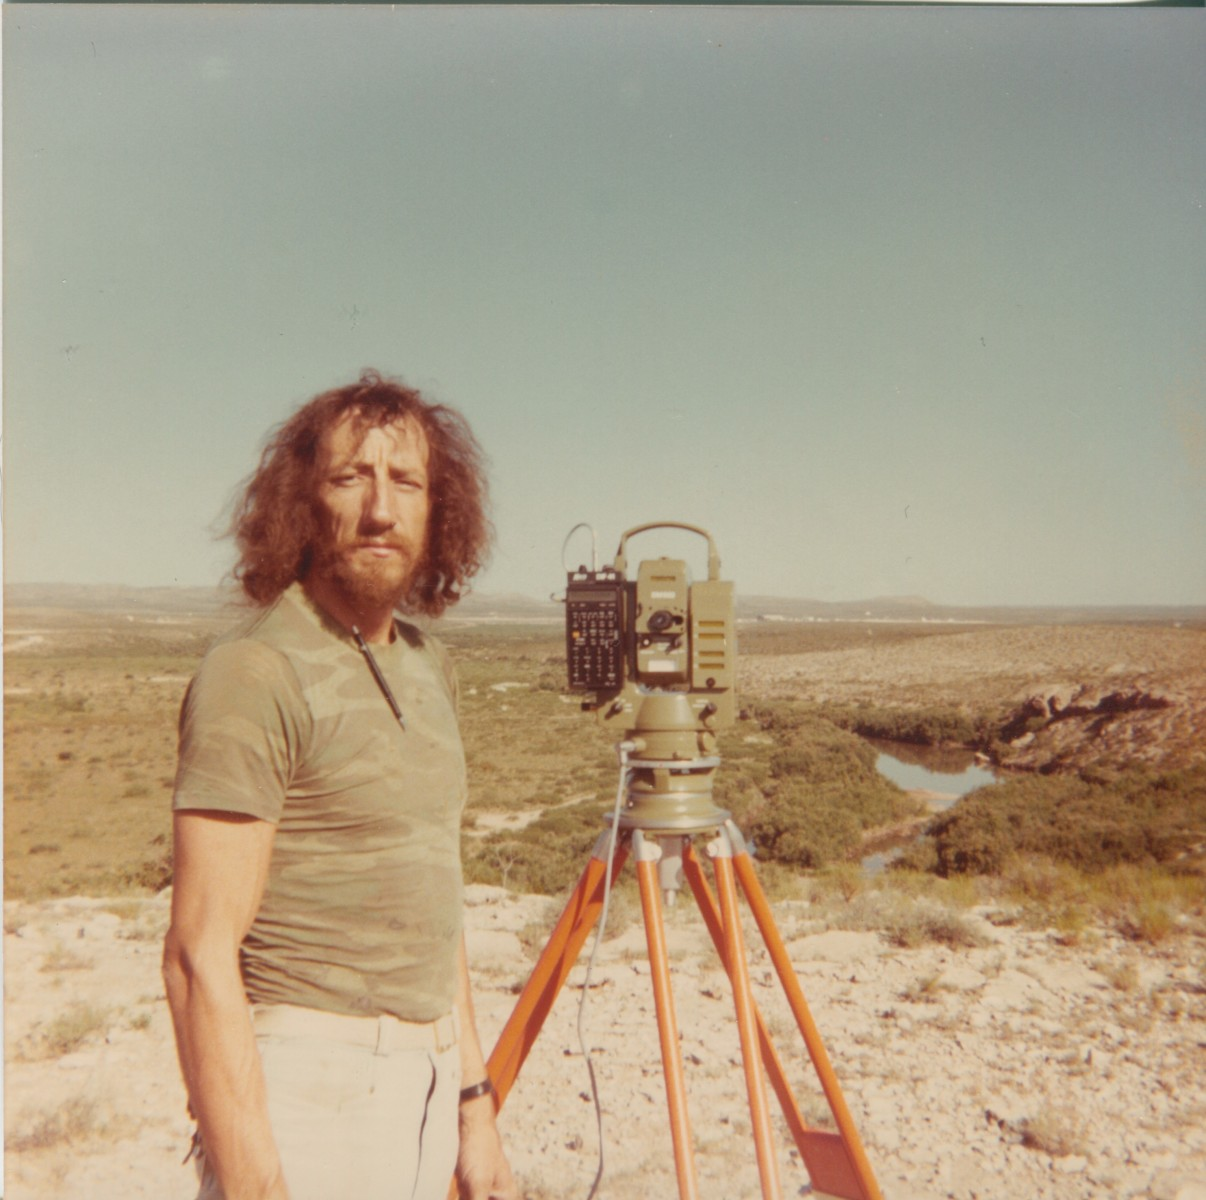 Surveyor and Instrument